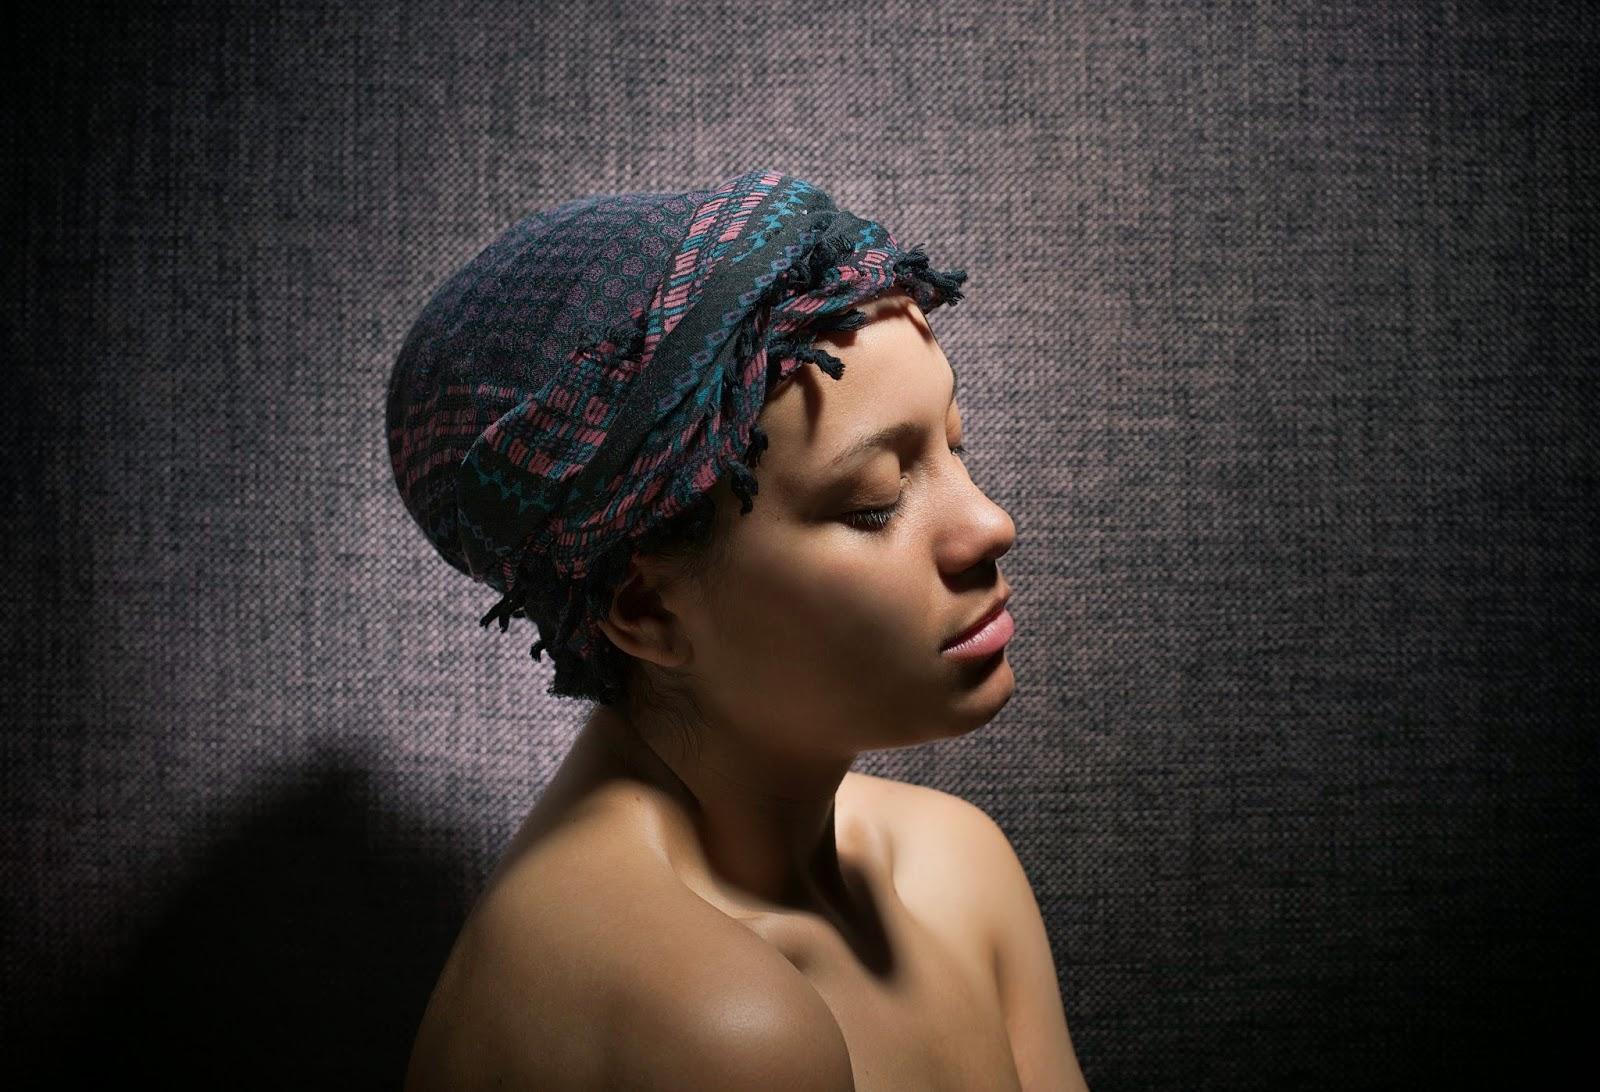 Angela Dennis - Foulard de nuit